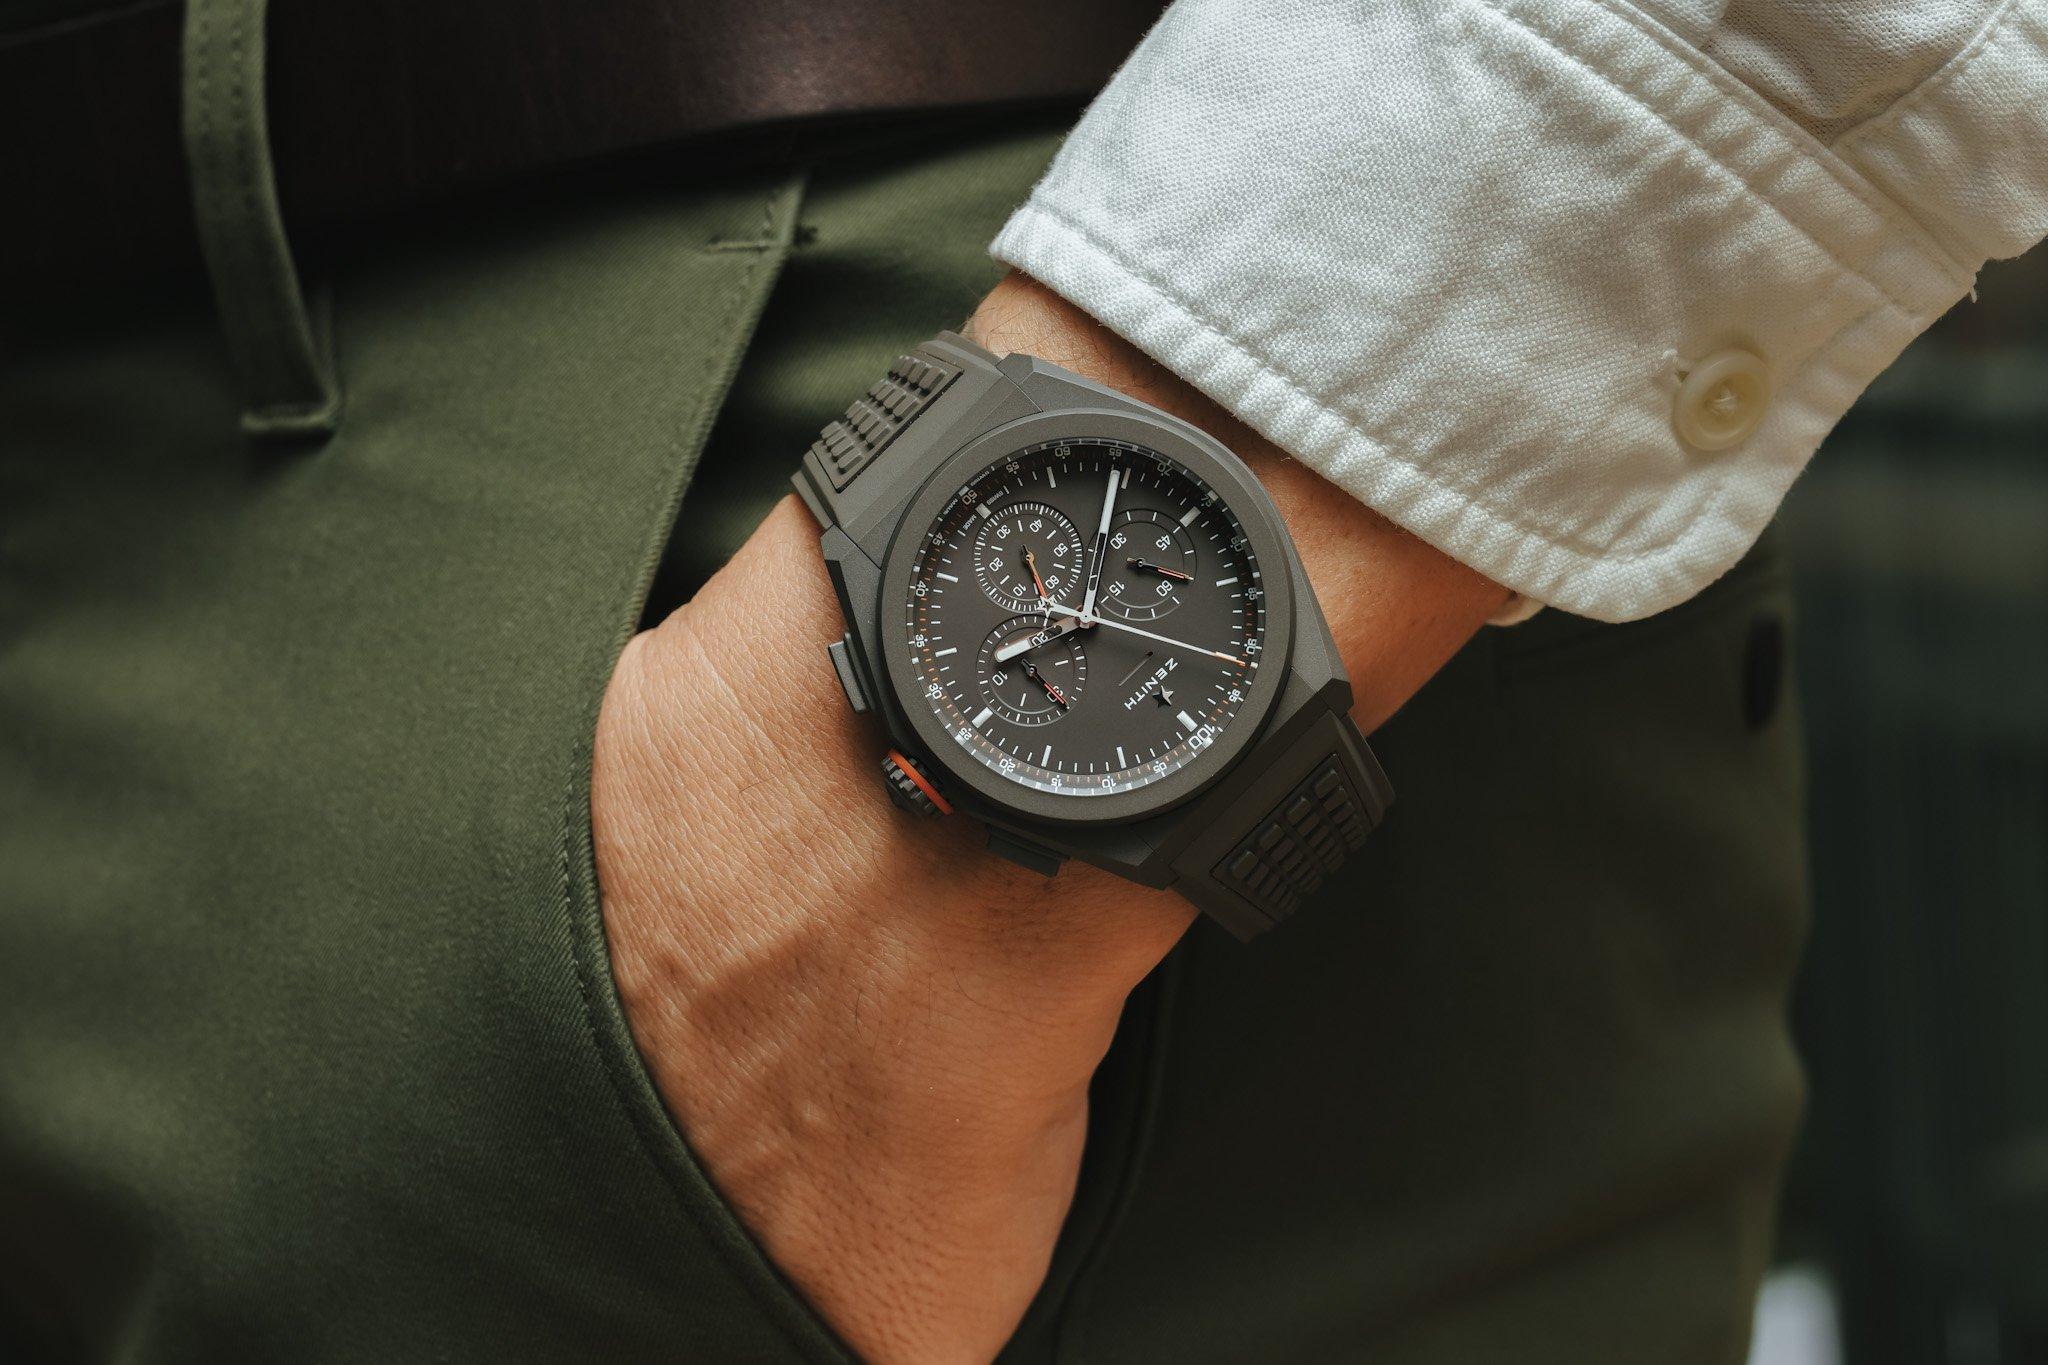 Обзор часов: Zenith El Primero Chronomaster Revival A385 с браслетом Gay Frères